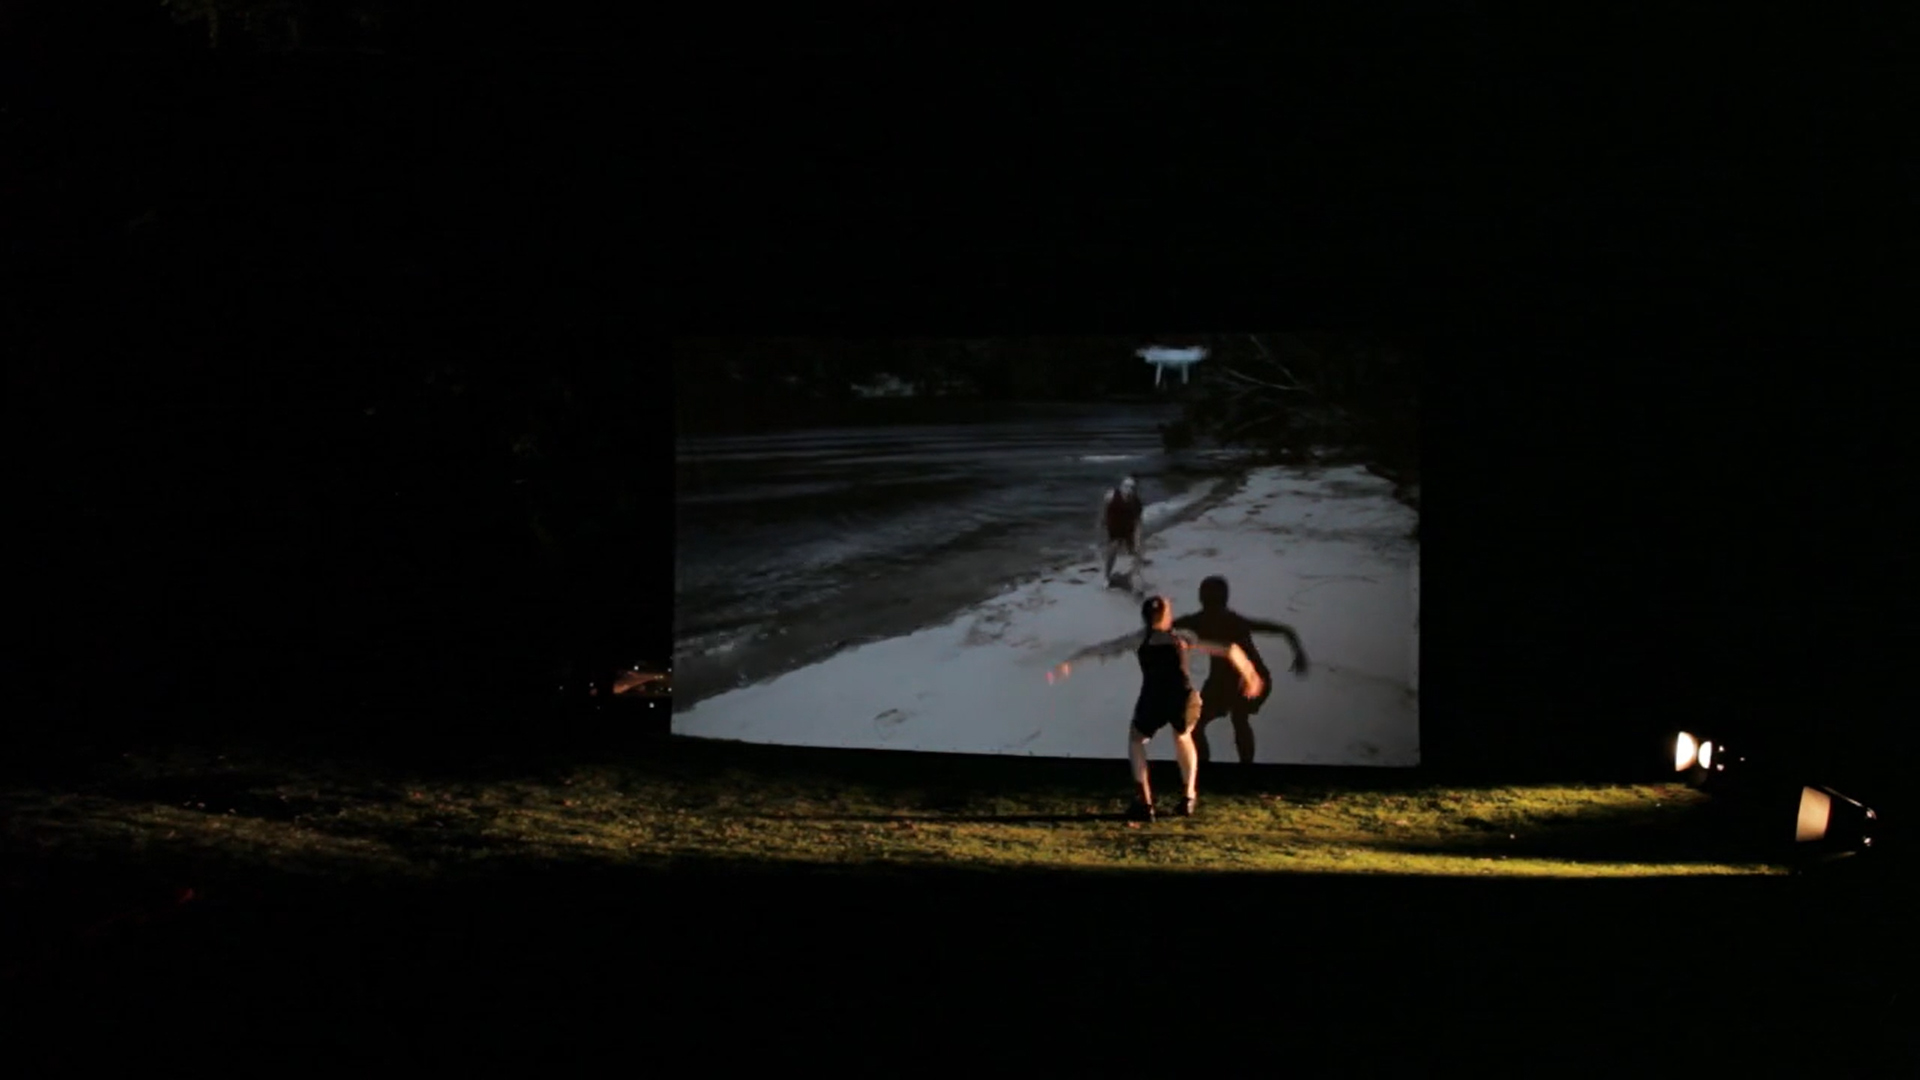 ©ISEA2015: 21st International Symposium on Electronic Art, Josephine Starrs and Leon Cmielewski, The Future Is Unmanned